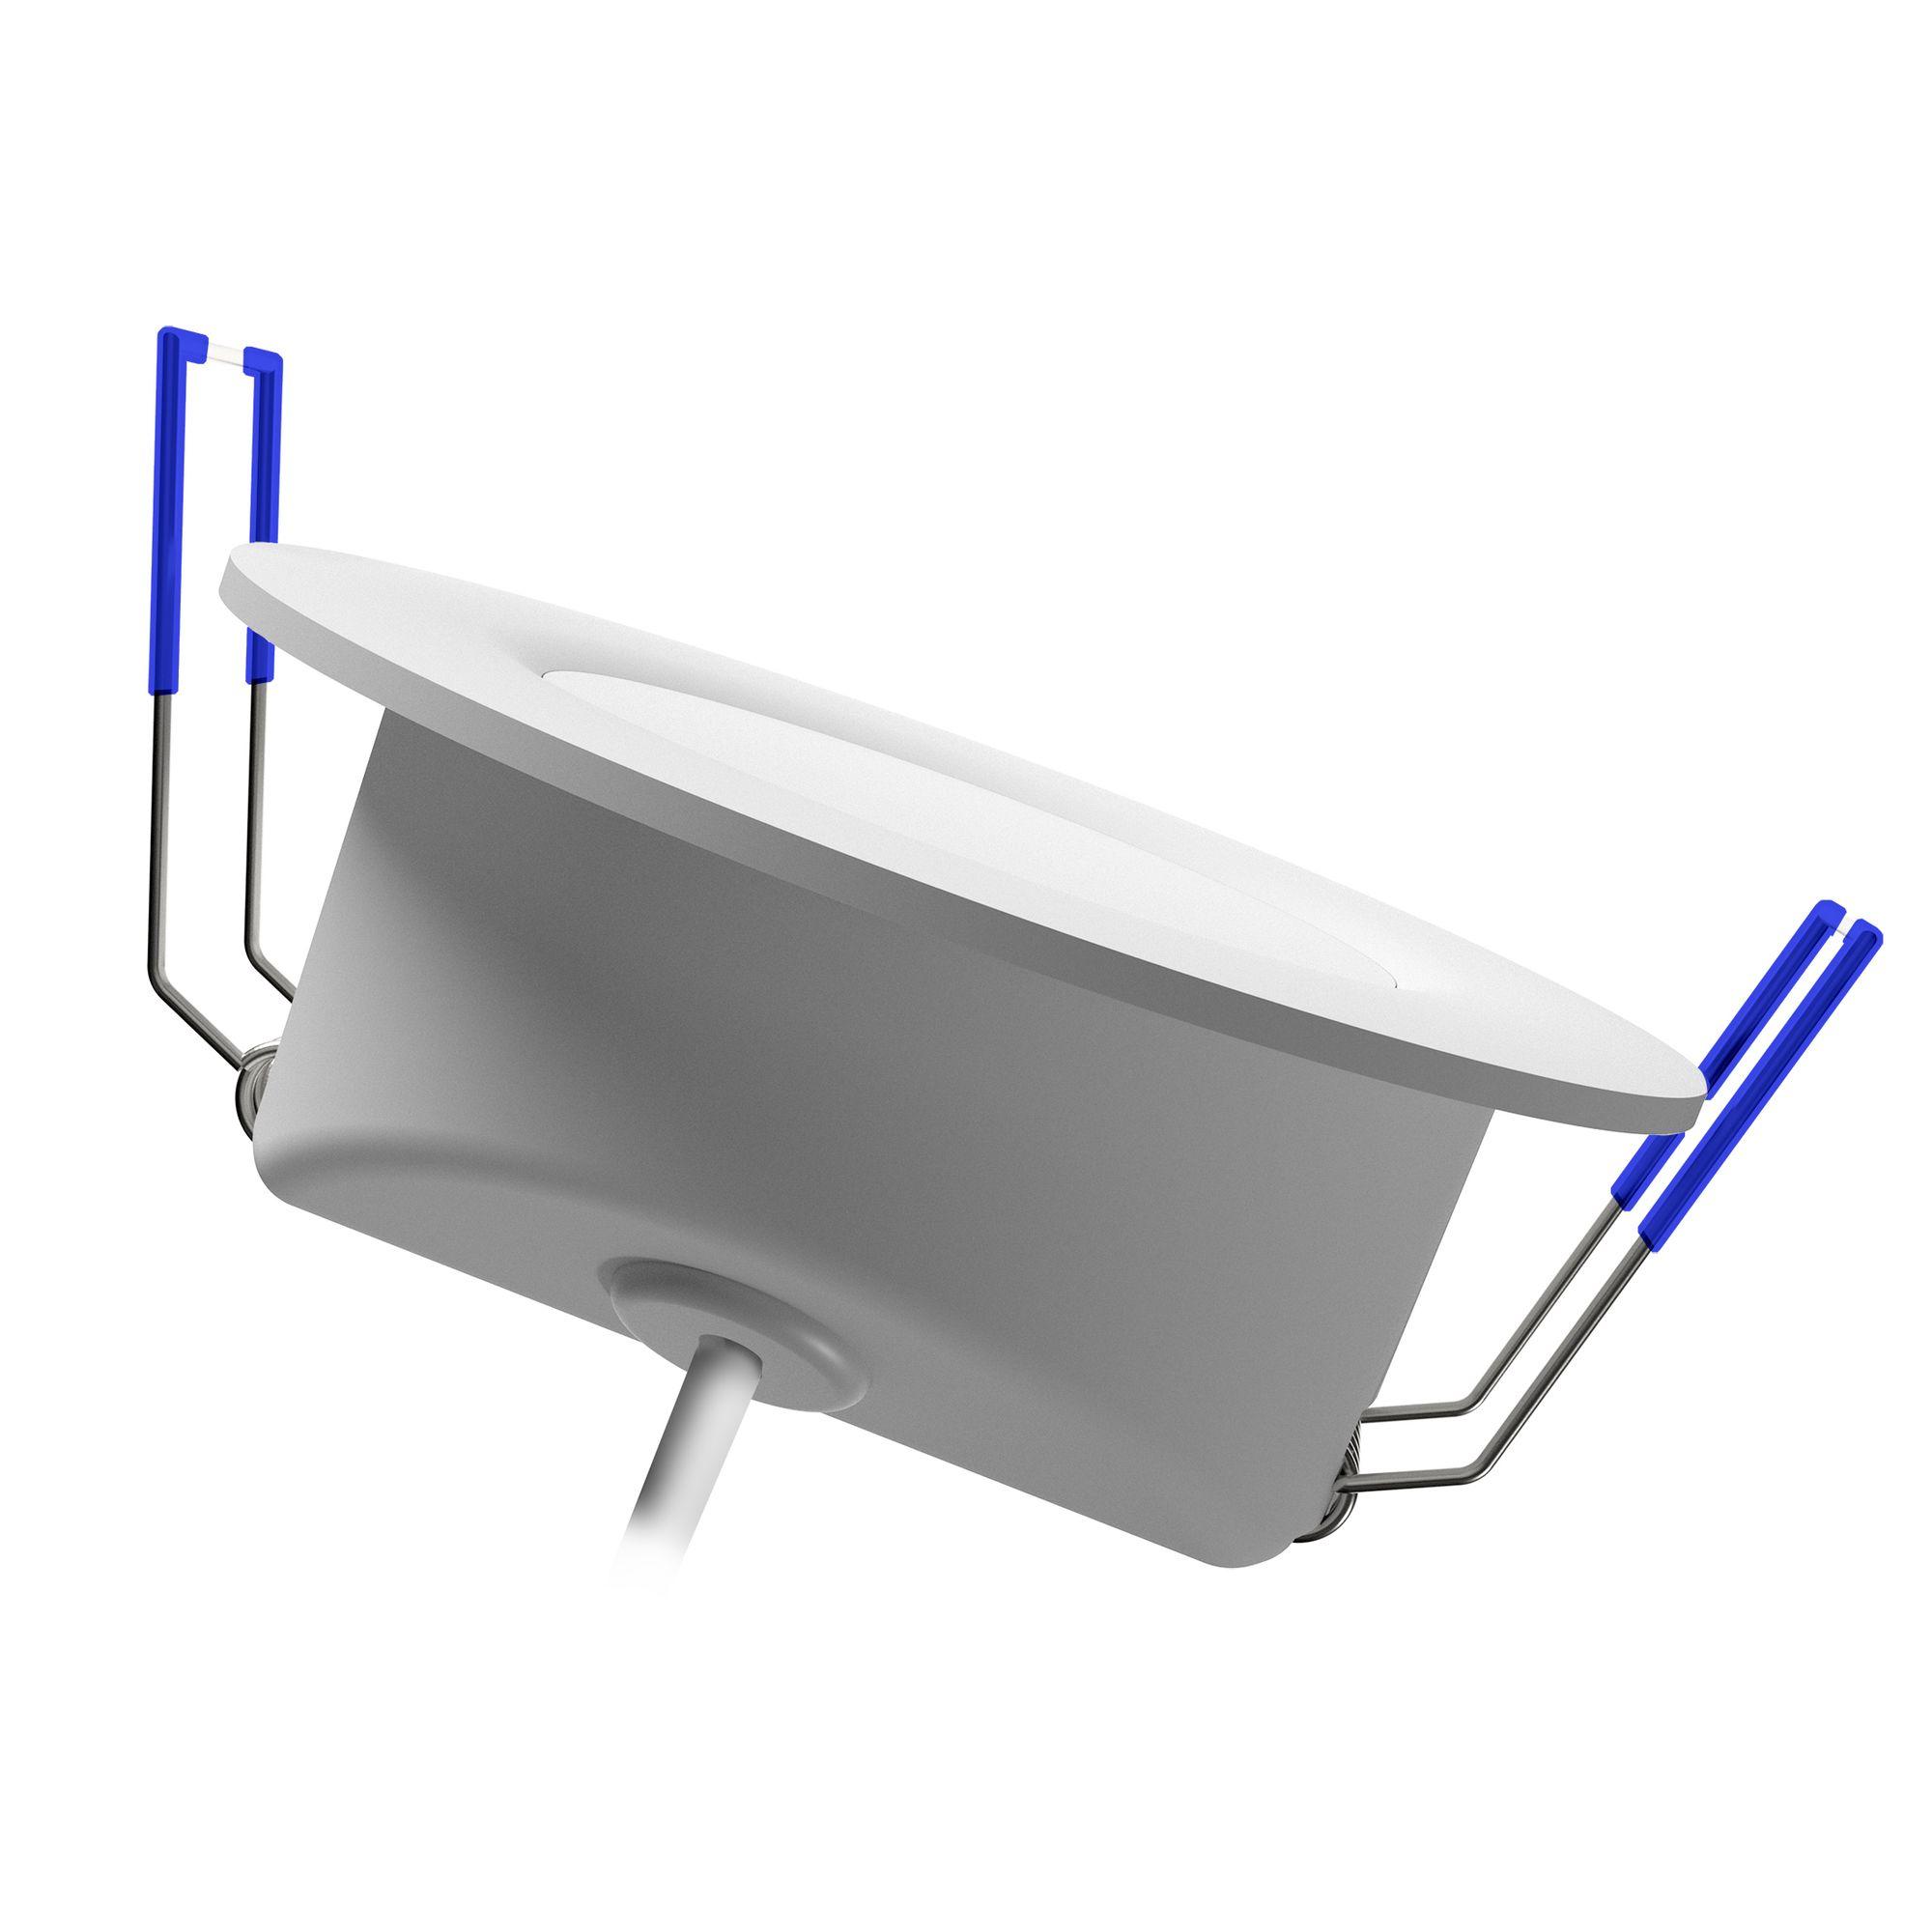 extra flache ip44 led einbauleuchten downlight modul 4000k 5w 450lm bad au en. Black Bedroom Furniture Sets. Home Design Ideas